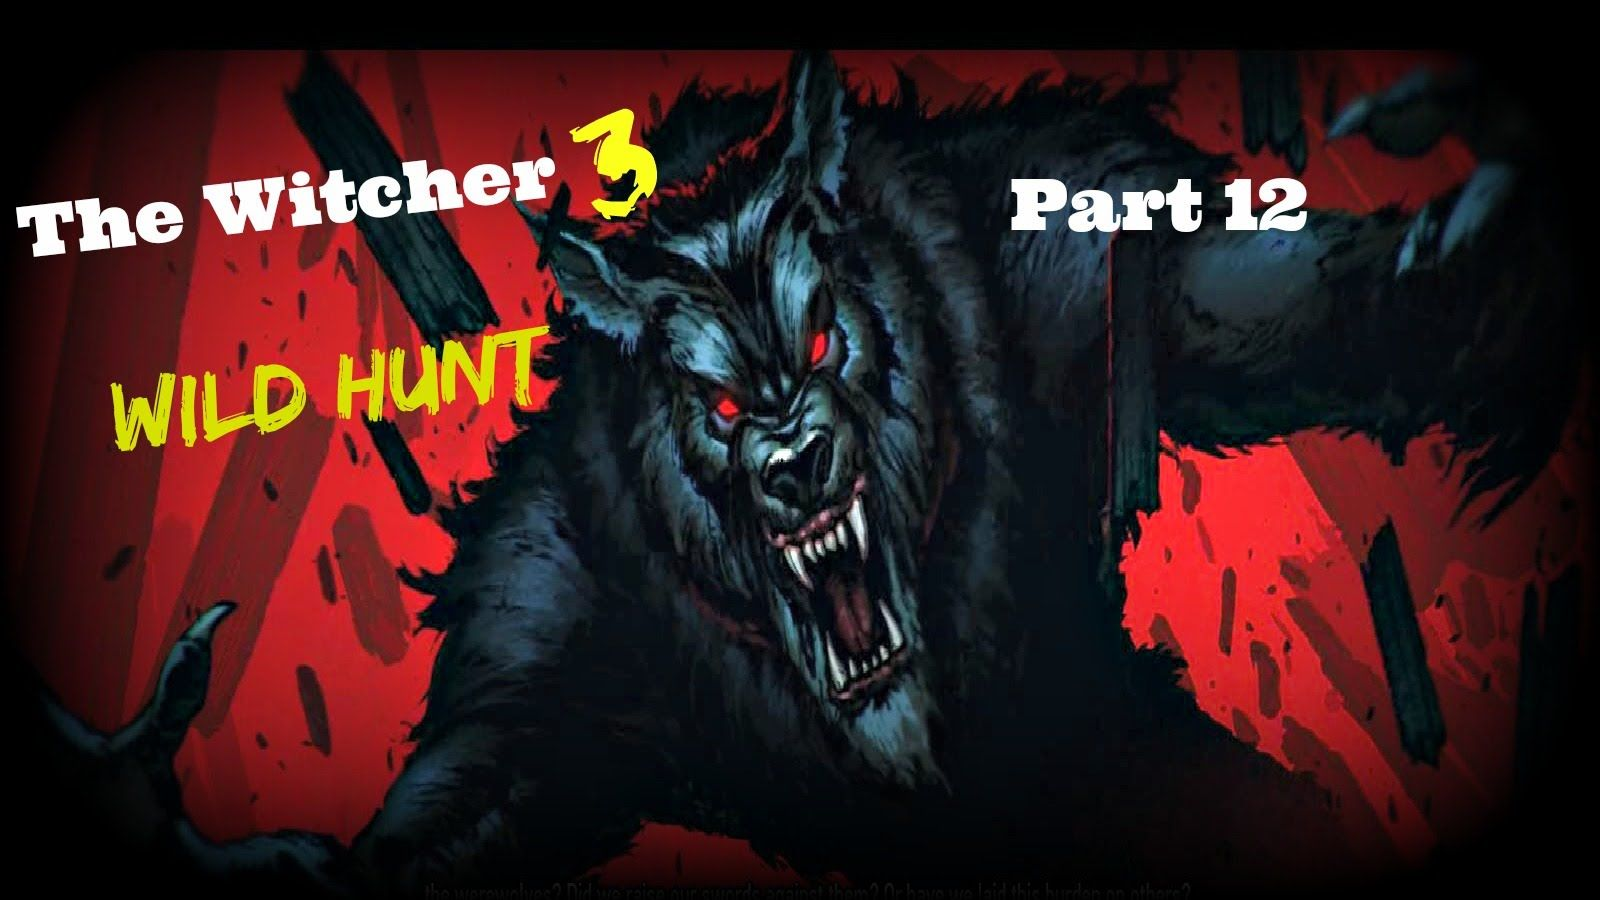 Witcher 3 Family Matters PT12 Walkthrough (PC,PS4